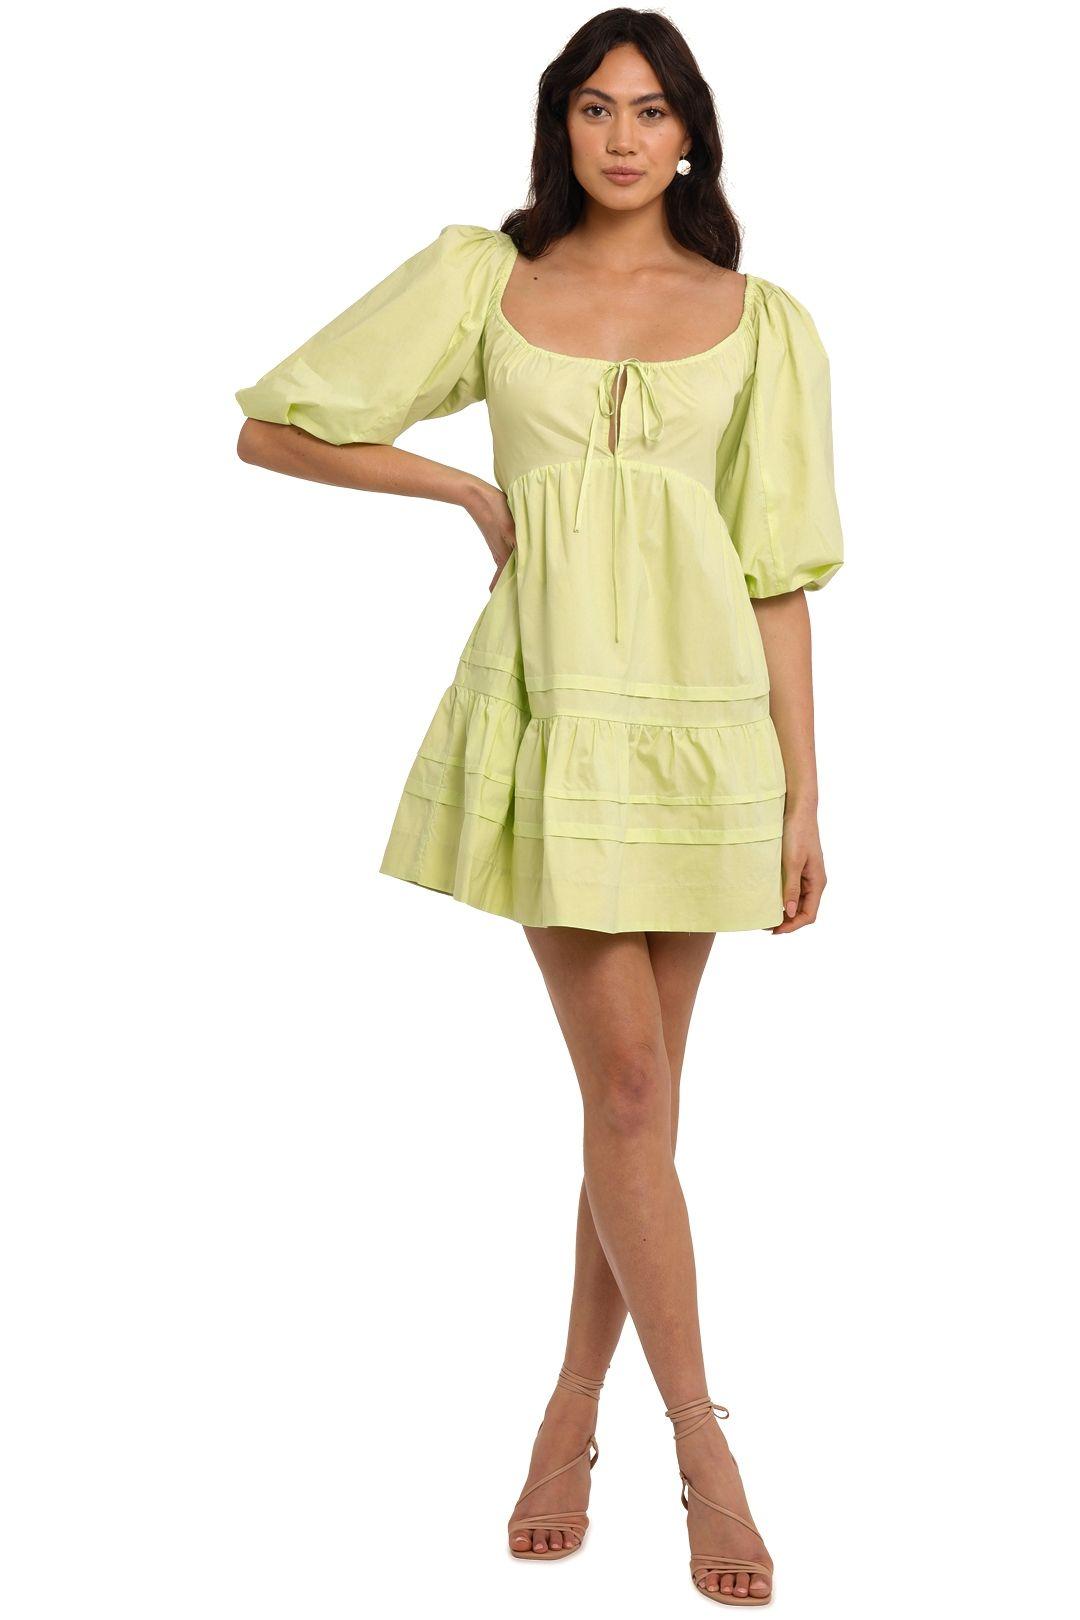 Nicholas Belle Dress Limeade scoop